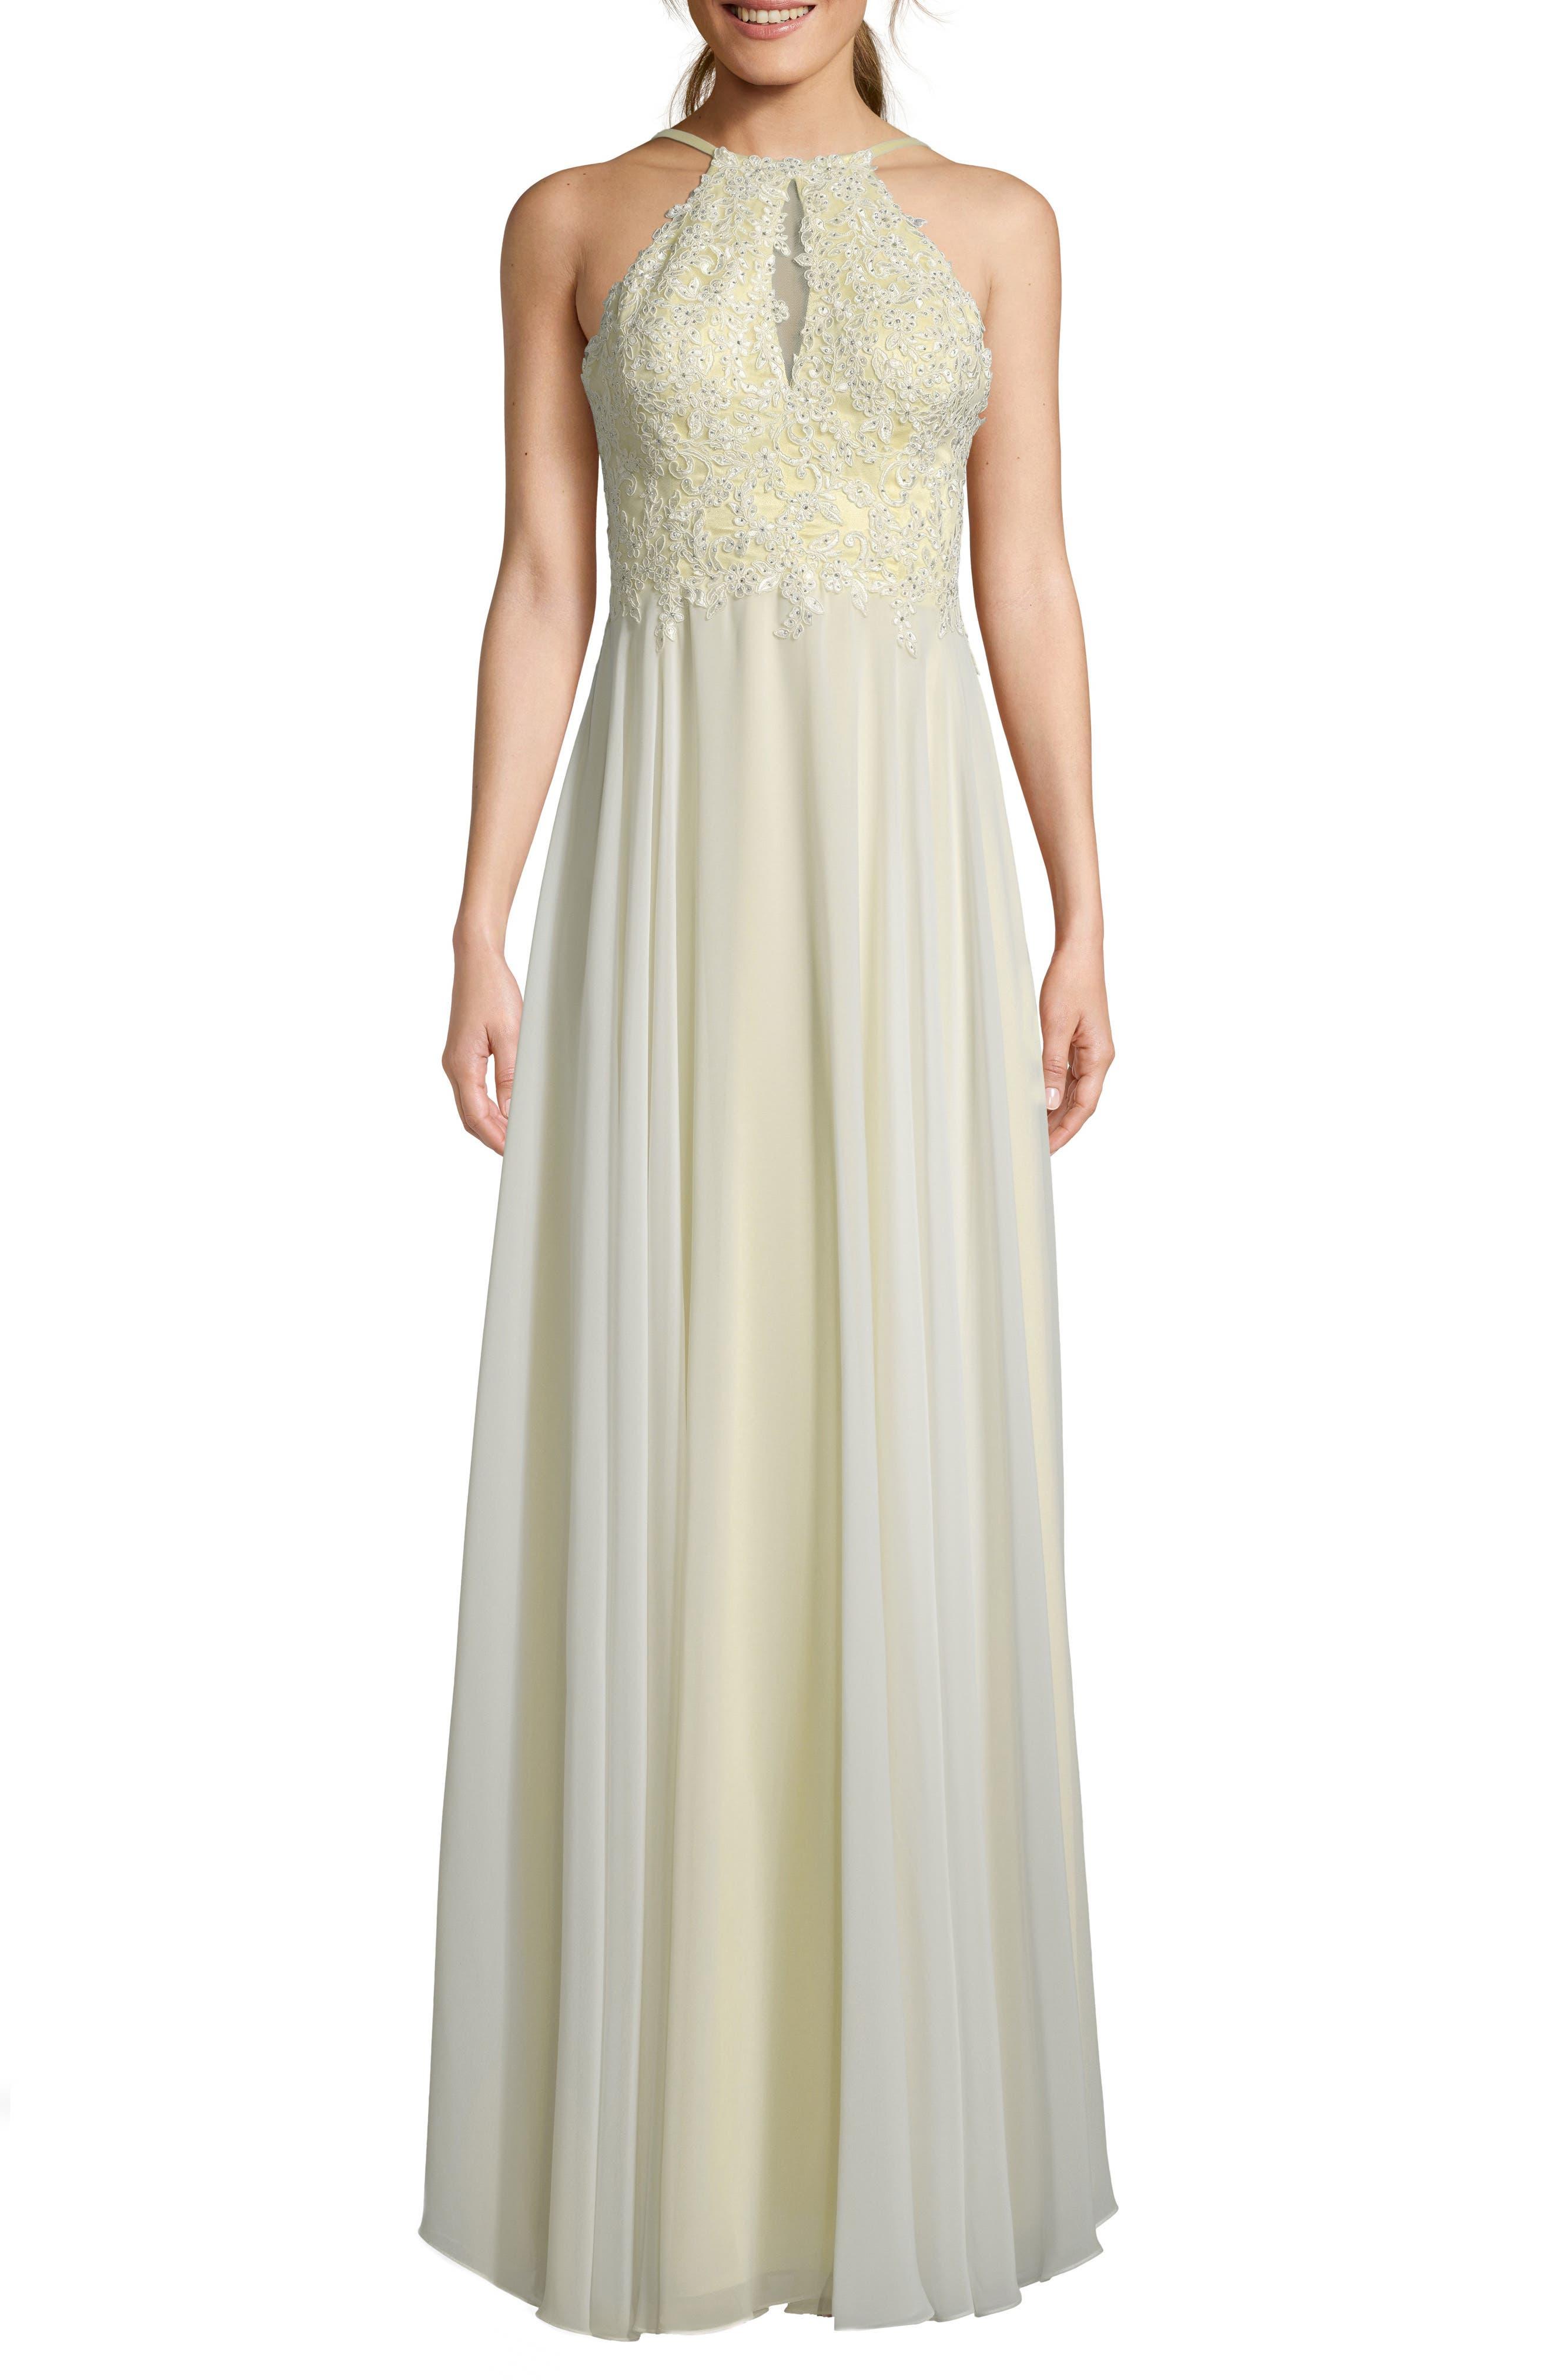 b6098bfe9f0b Xscape Beaded 3D Floral Lace Chiffon Evening Dress, Yellow